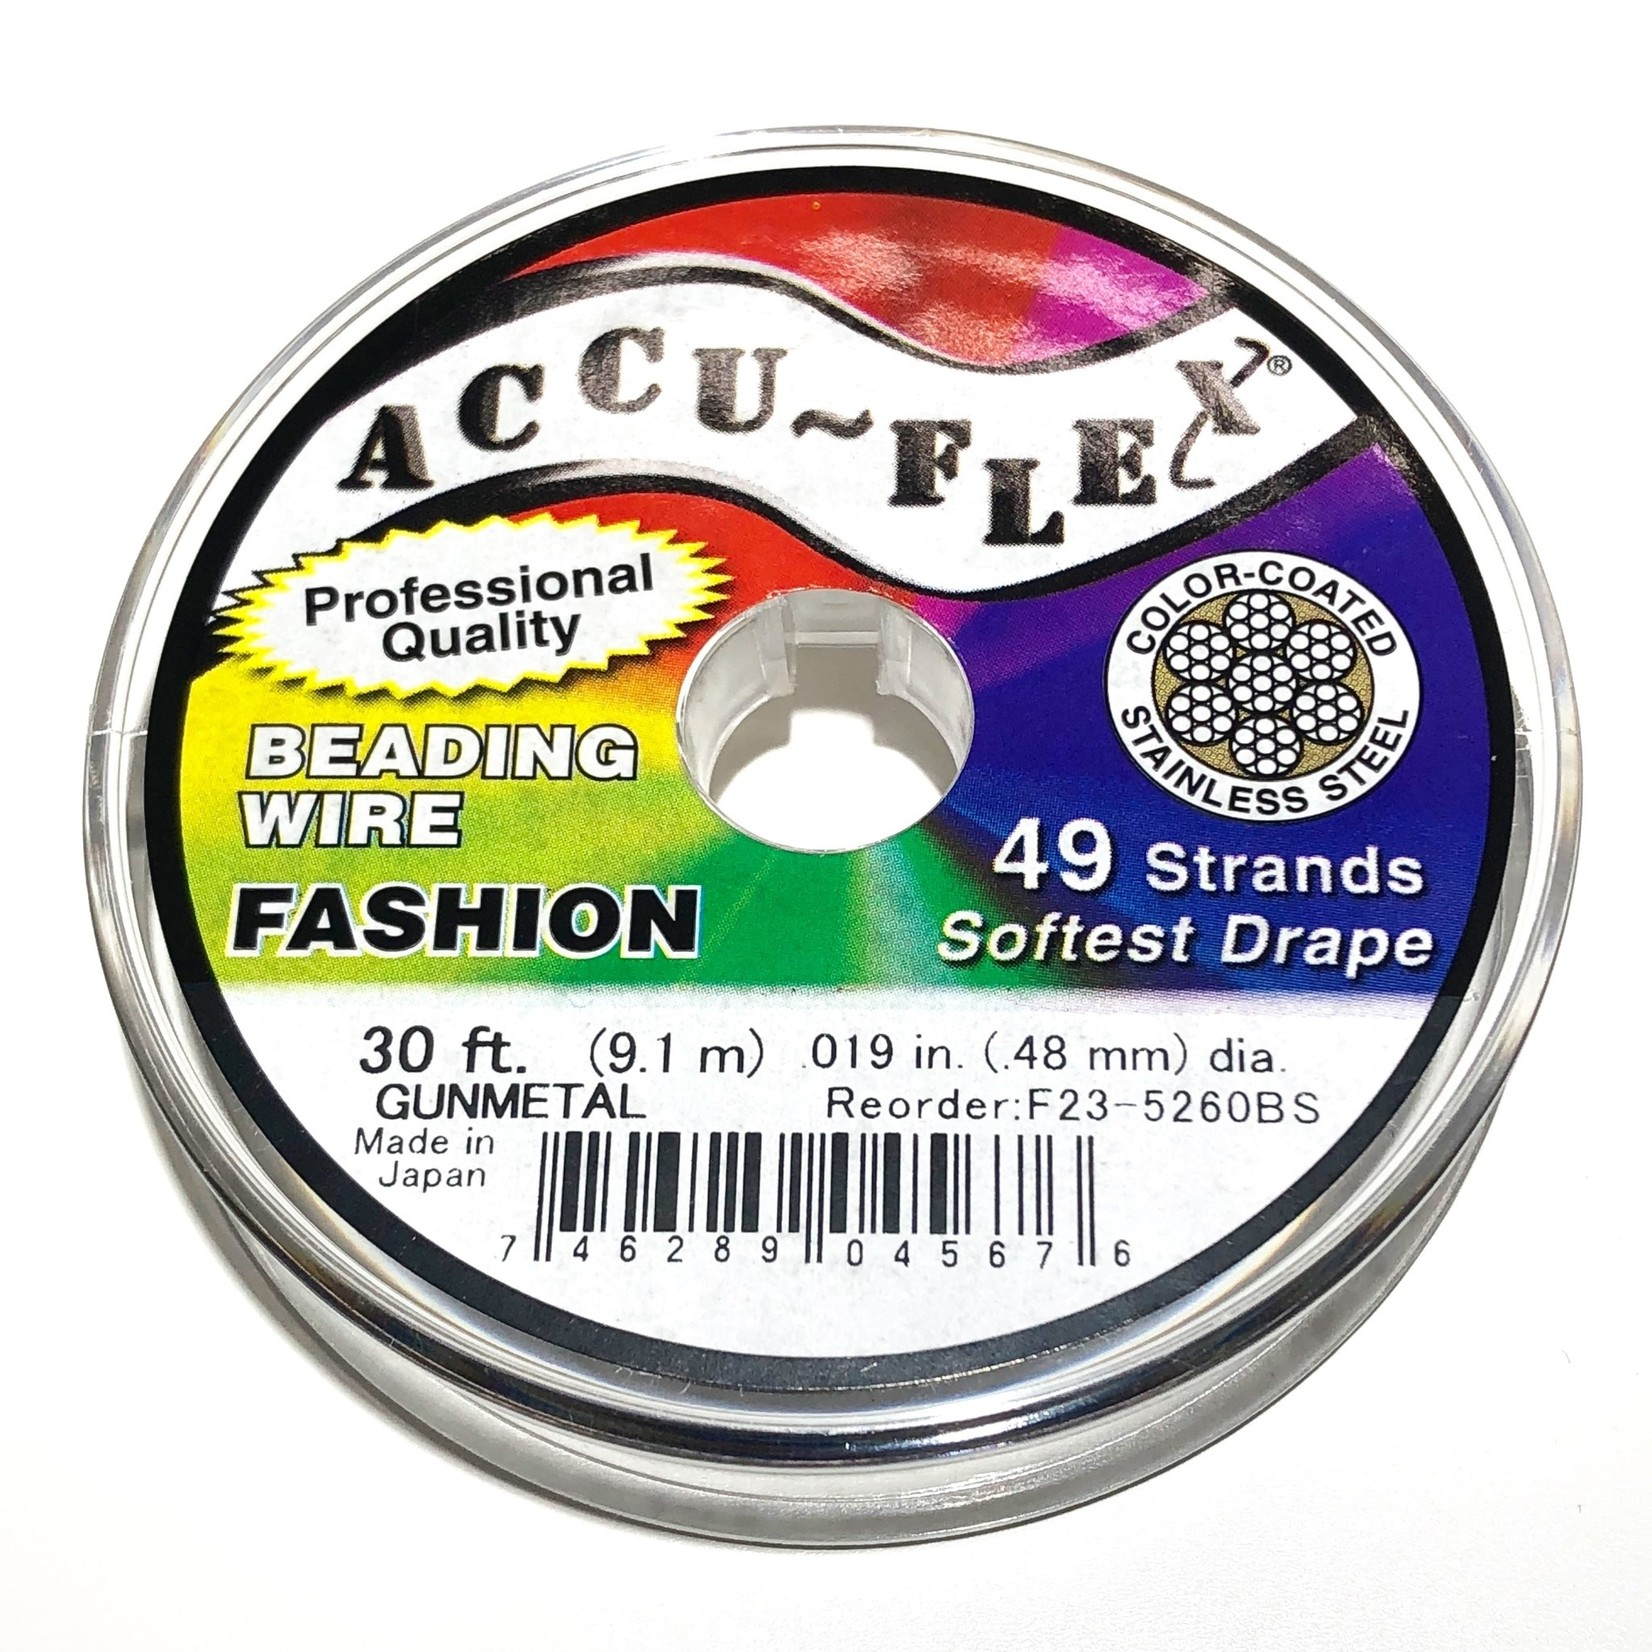 ACCU FLEX Bead Wire 49 Str .019in, 30 Ft GunMetal